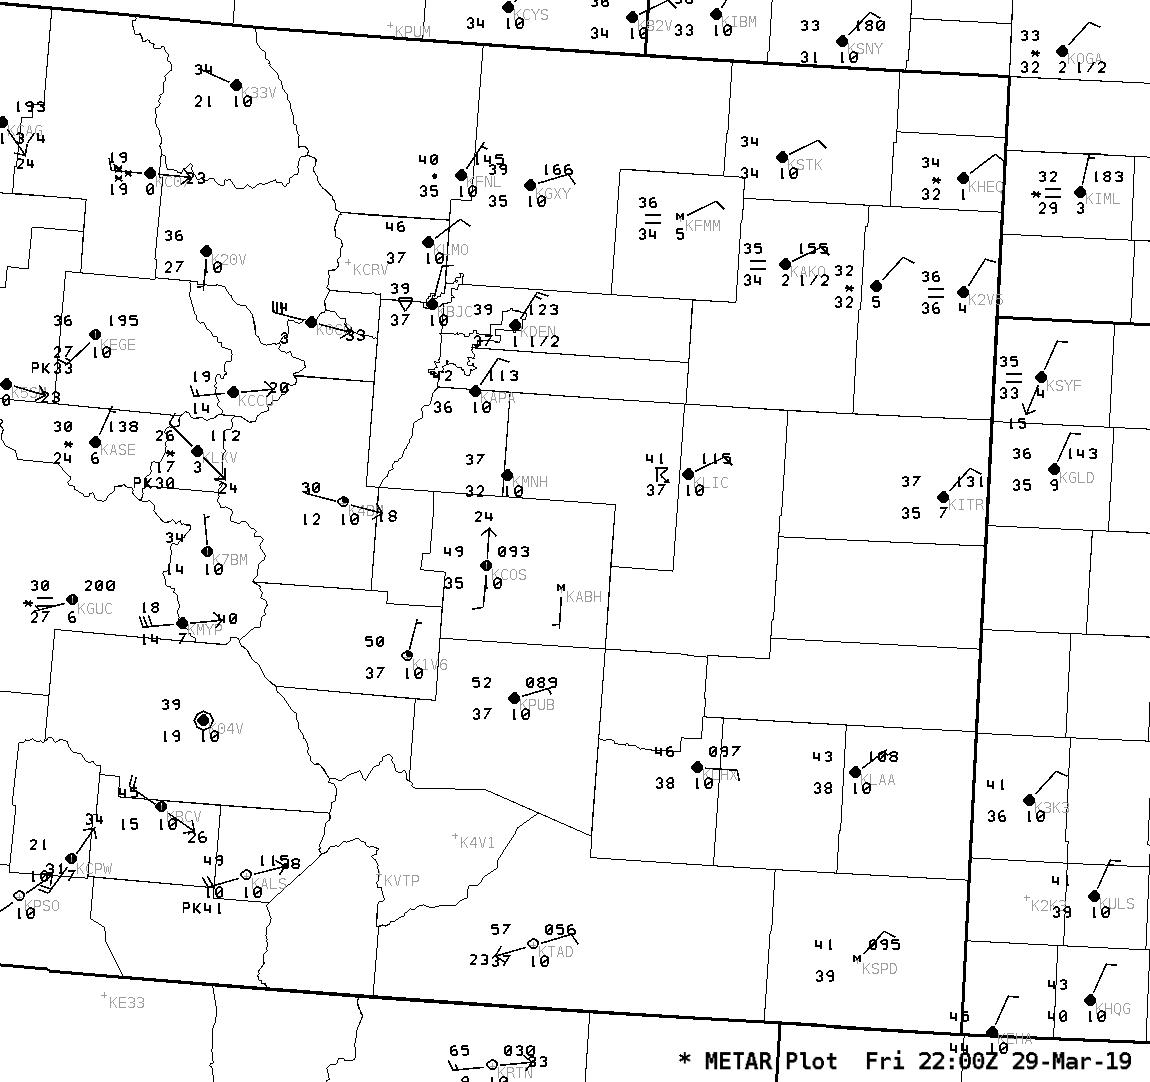 21012 Colorado Wiring Diagram. . Wiring Diagram on